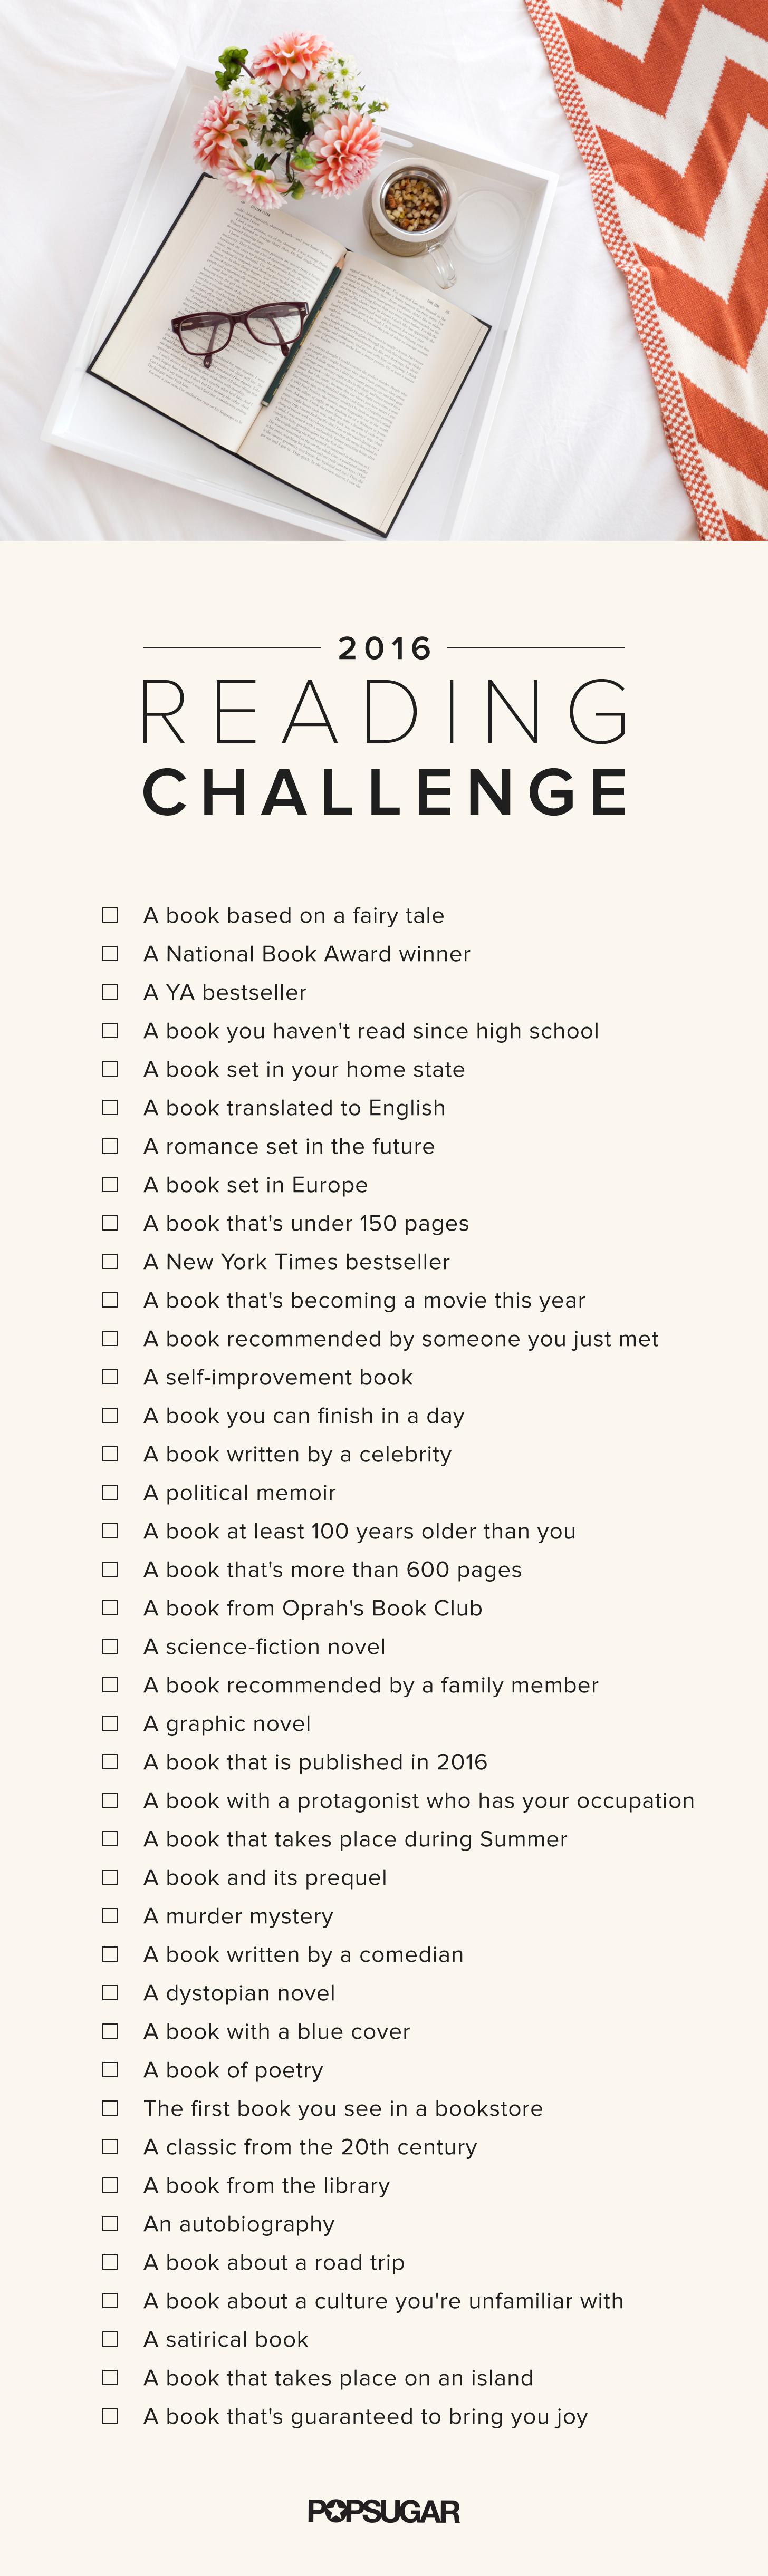 POPSUGAR's Reading Challenge 2016